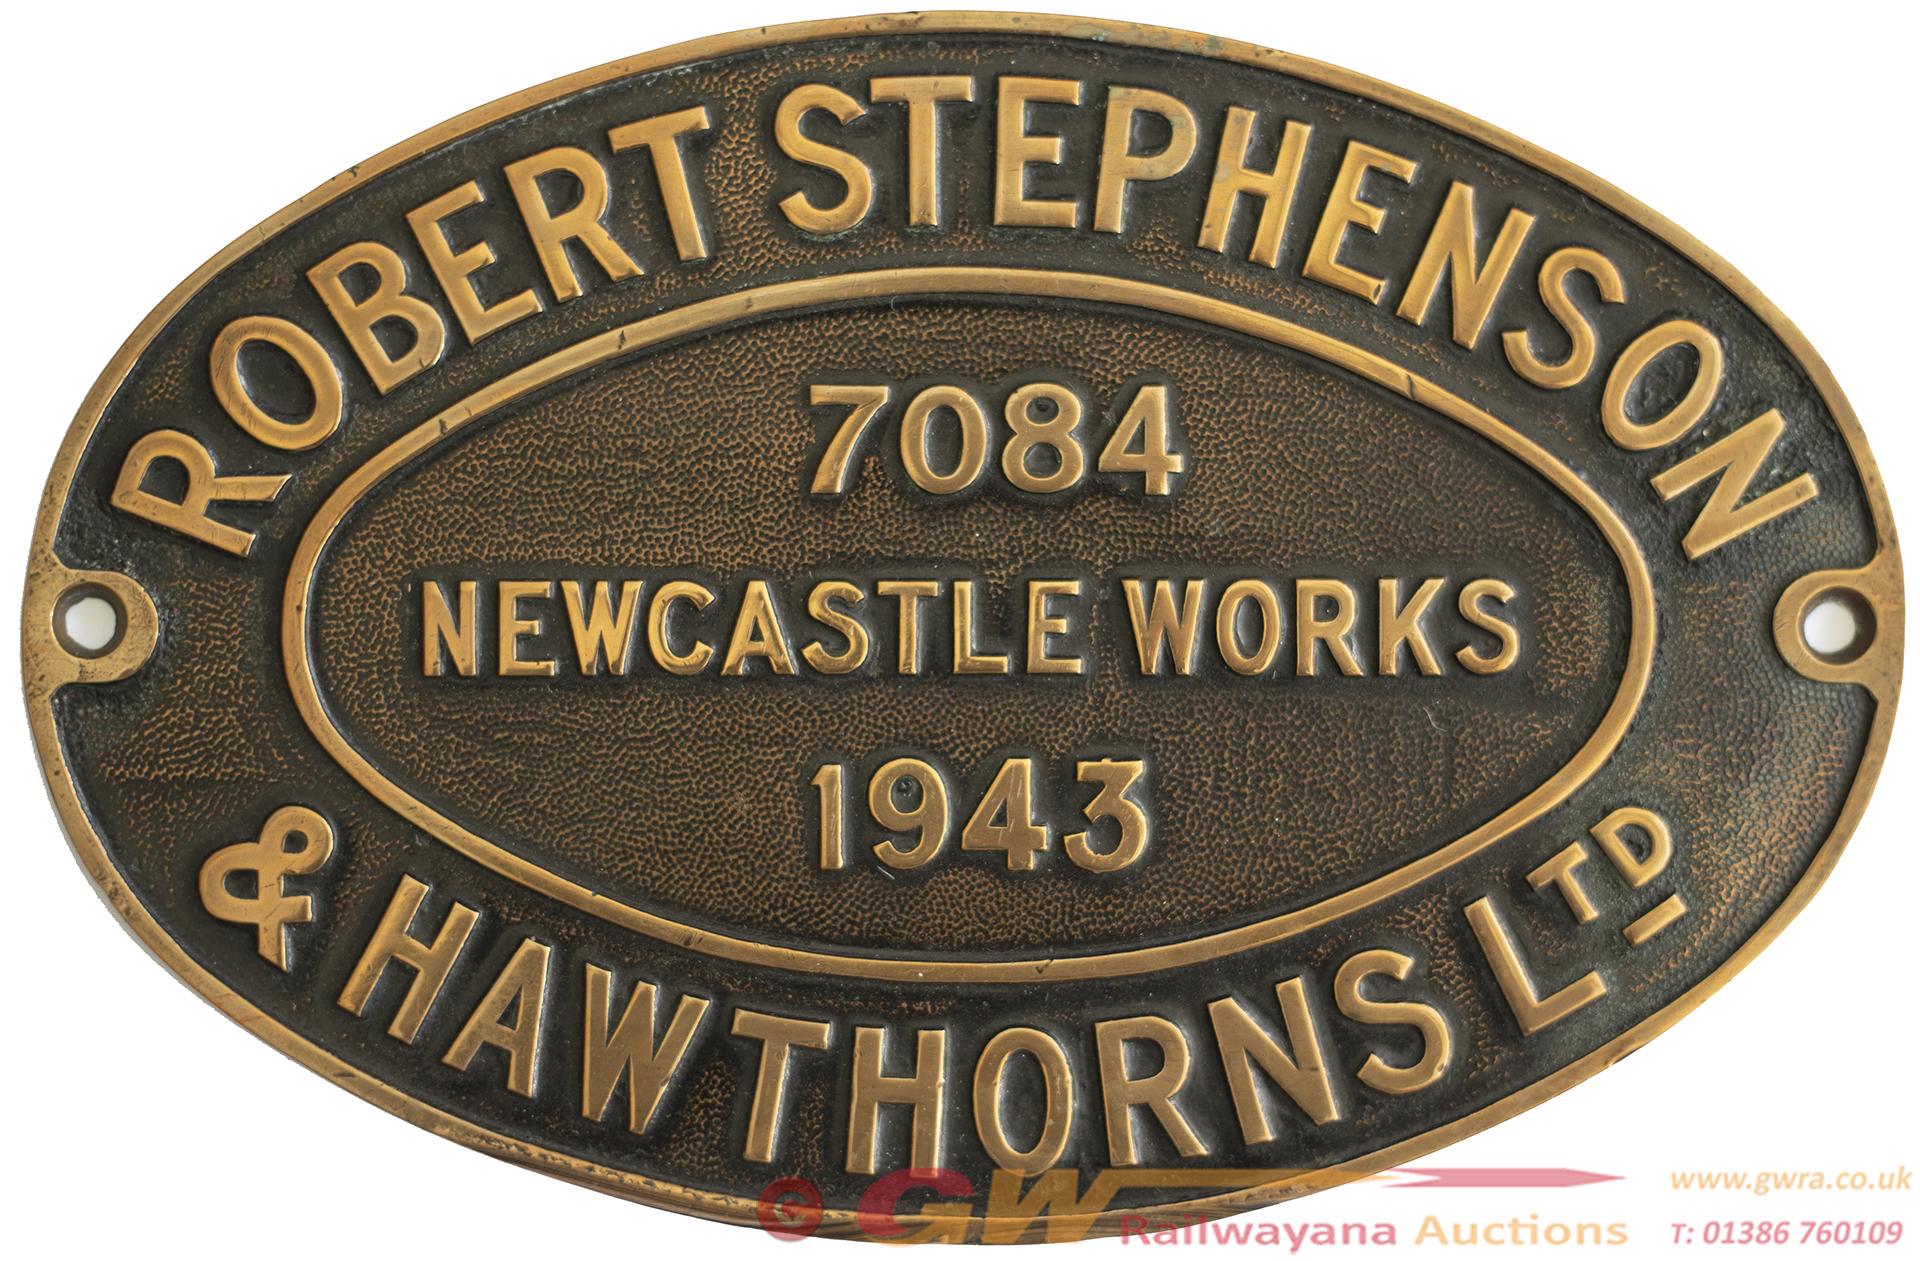 <P>Worksplate ROBERT STEPHENSON & HAWTHORNS LTD